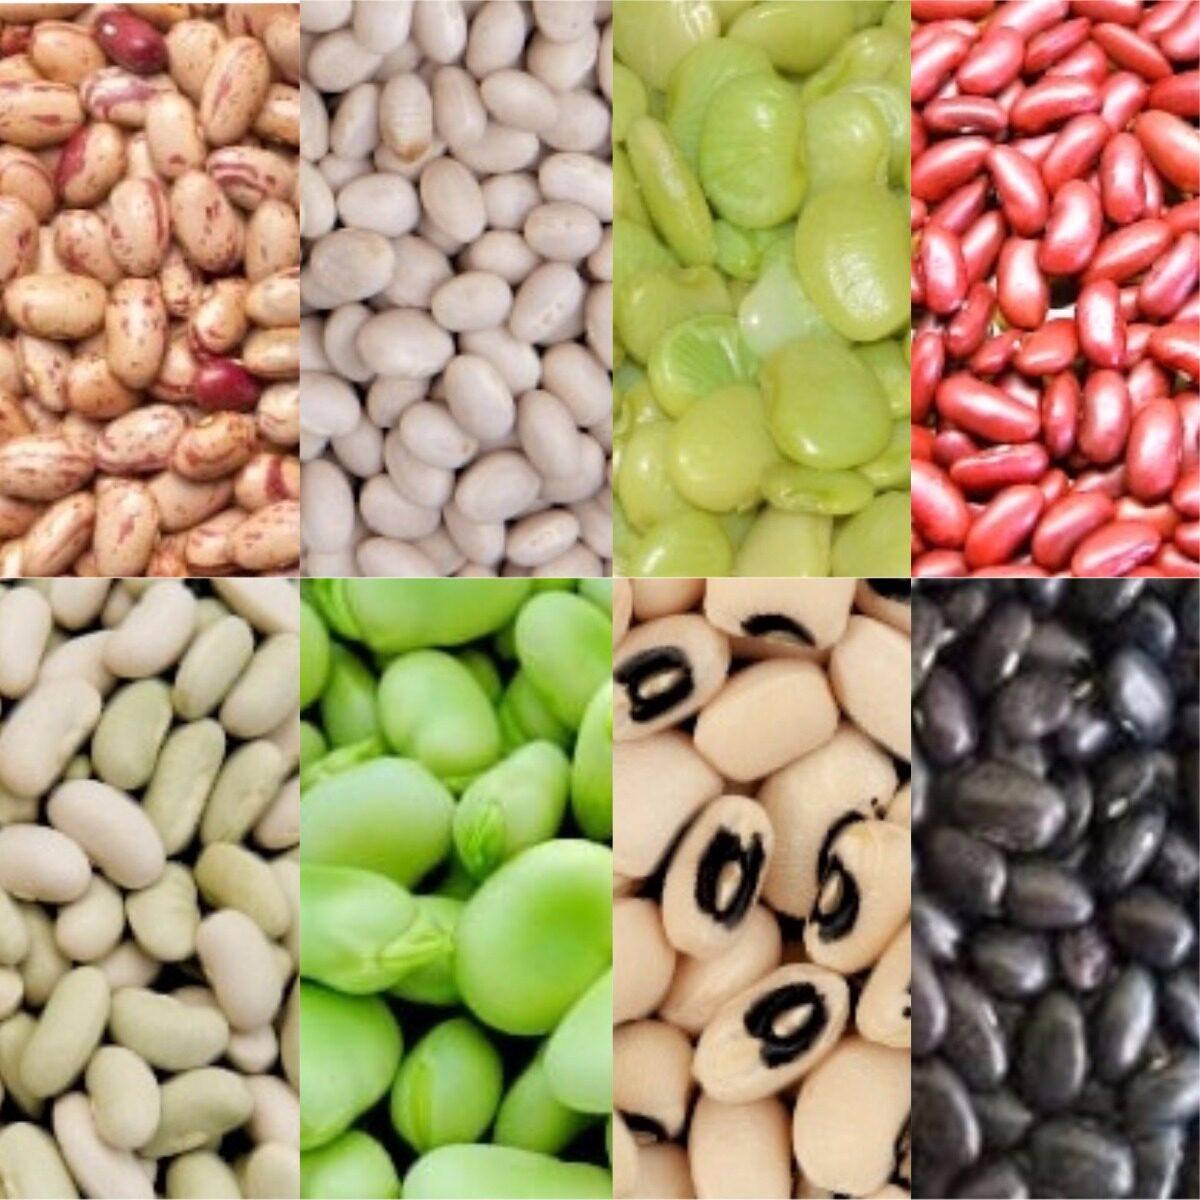 Beans, Beans, Beans